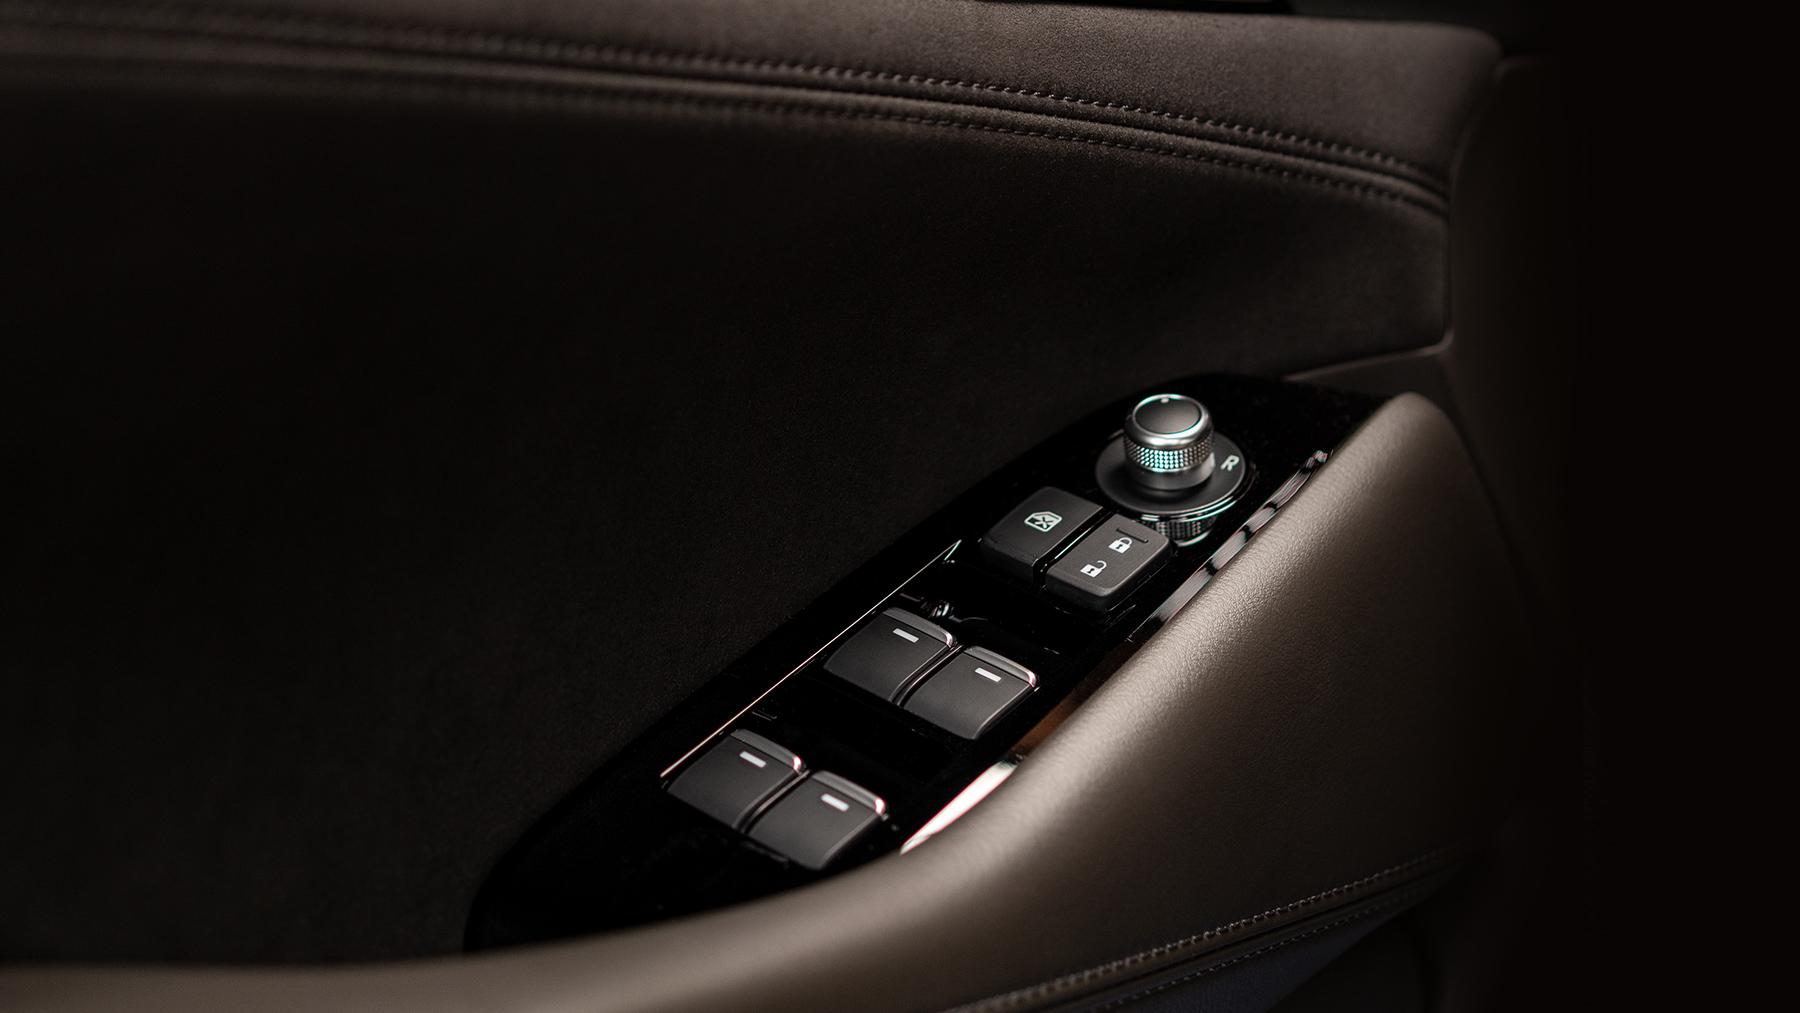 2019 Mazda6 Controls